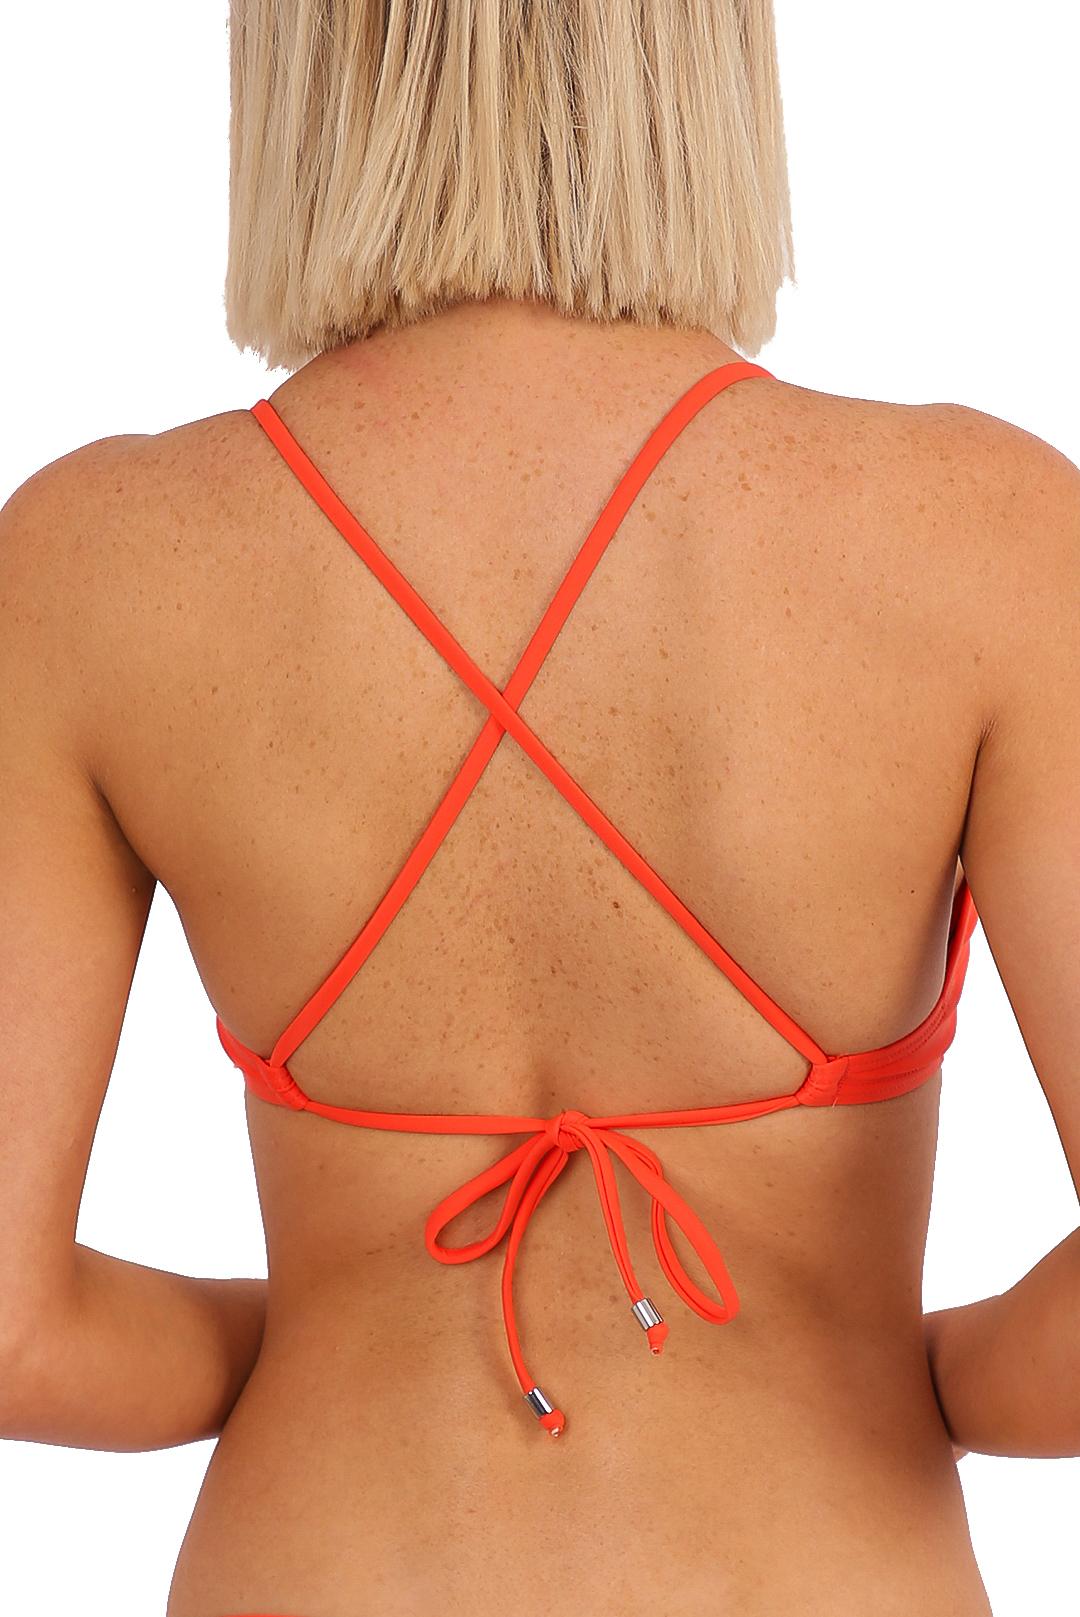 'Lola' Bralette Tie Back - Clementina